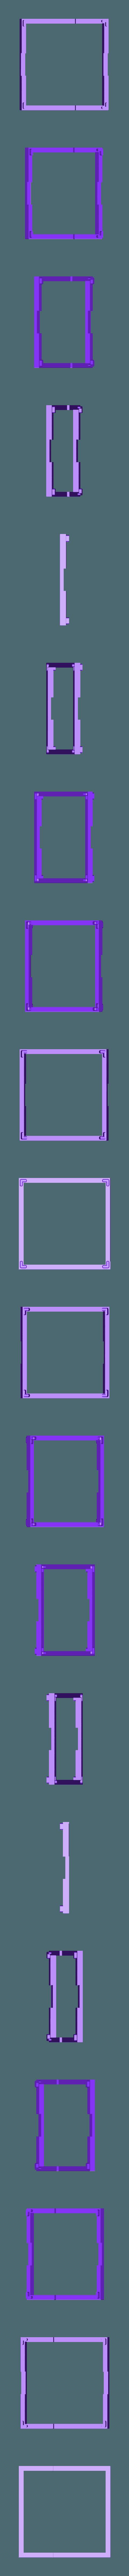 Modular_Floor_Spacer.stl Download free STL file Modular Mech Buildings • 3D printable object, mrhers2